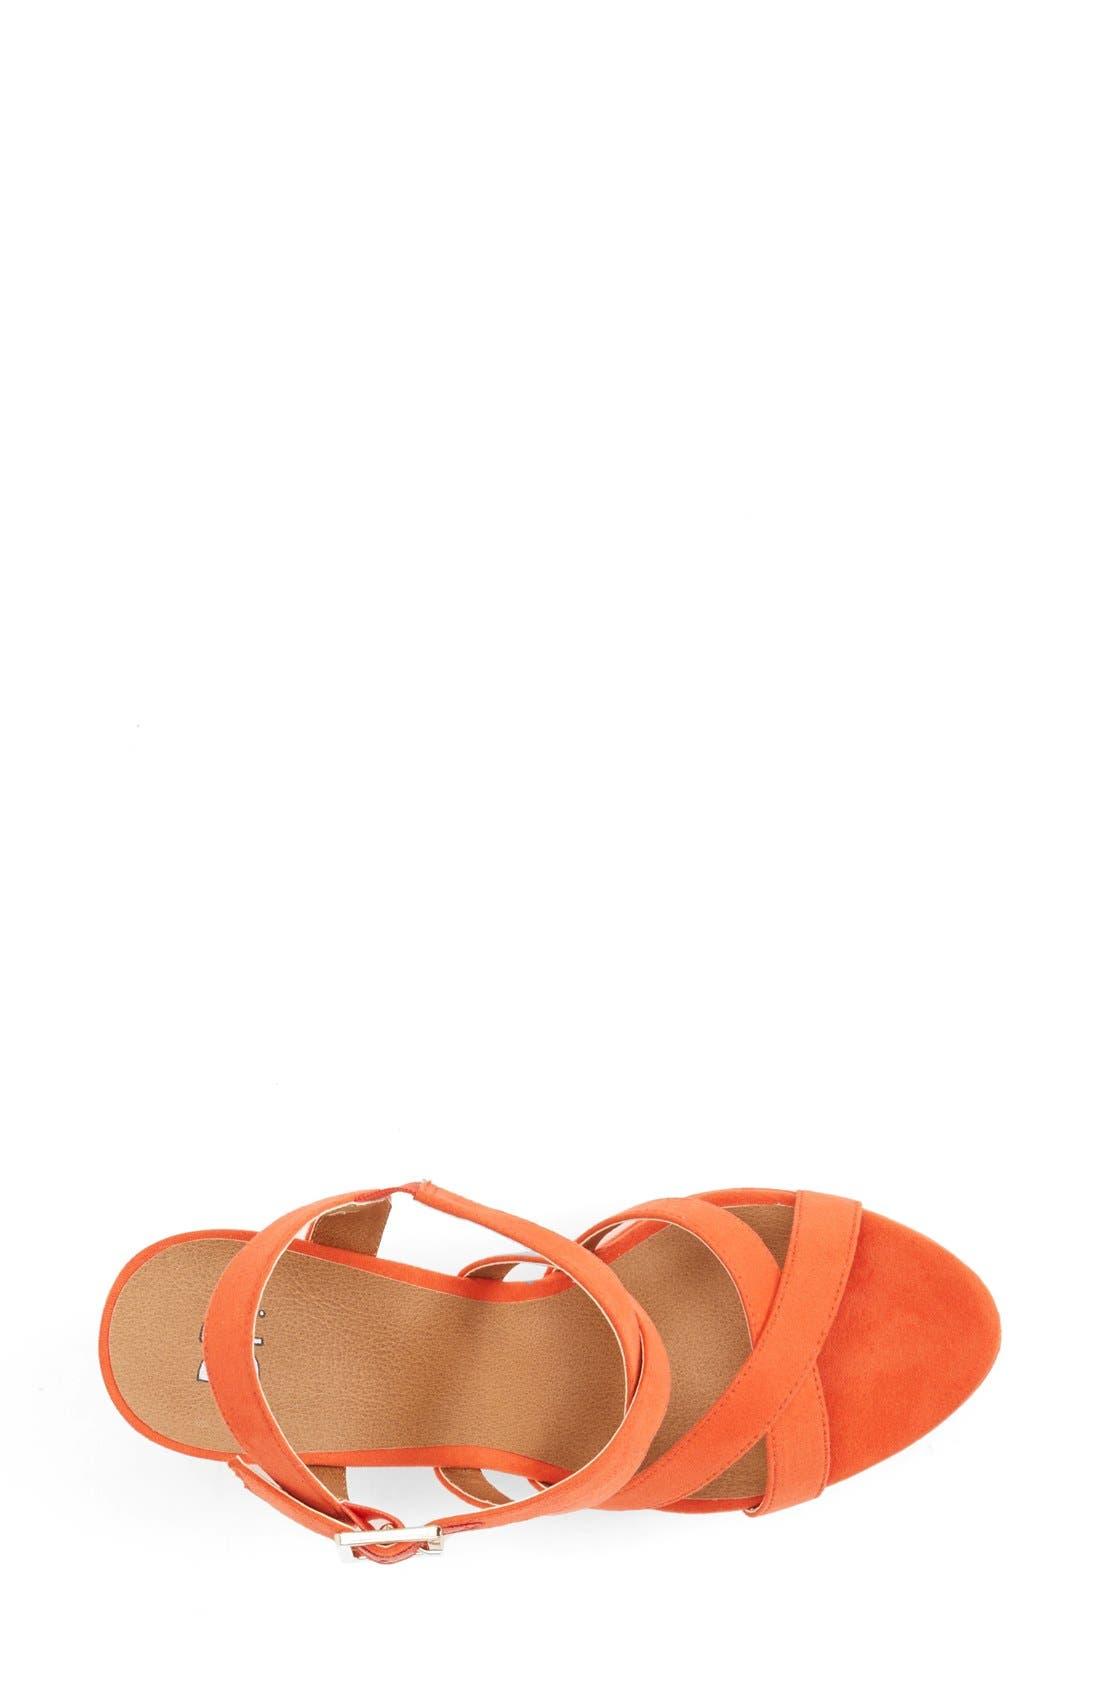 'Summers' Wedge Sandal,                             Alternate thumbnail 26, color,